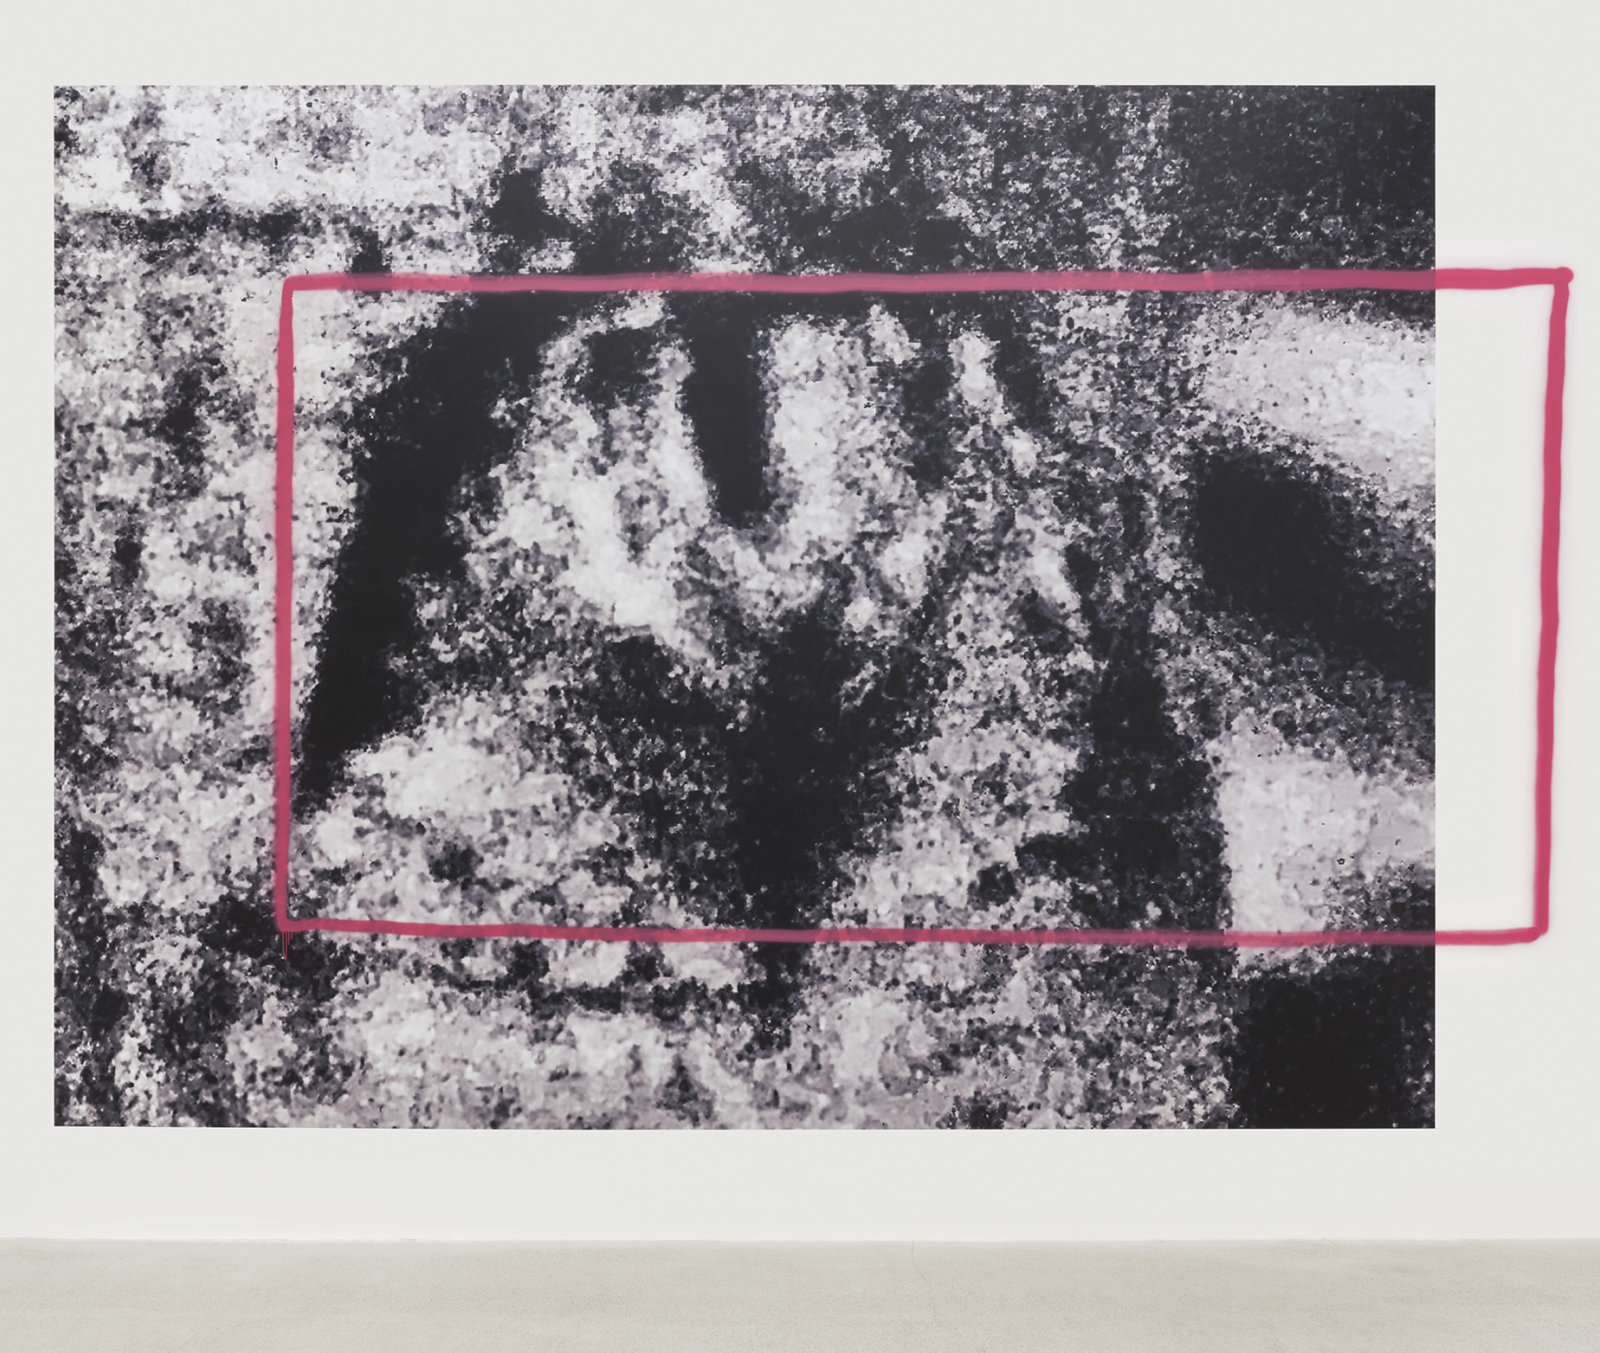 Duane Linklater, latealex, 2020, vinyl, spray paint, 182 x 261 in. (462 x 663 cm)